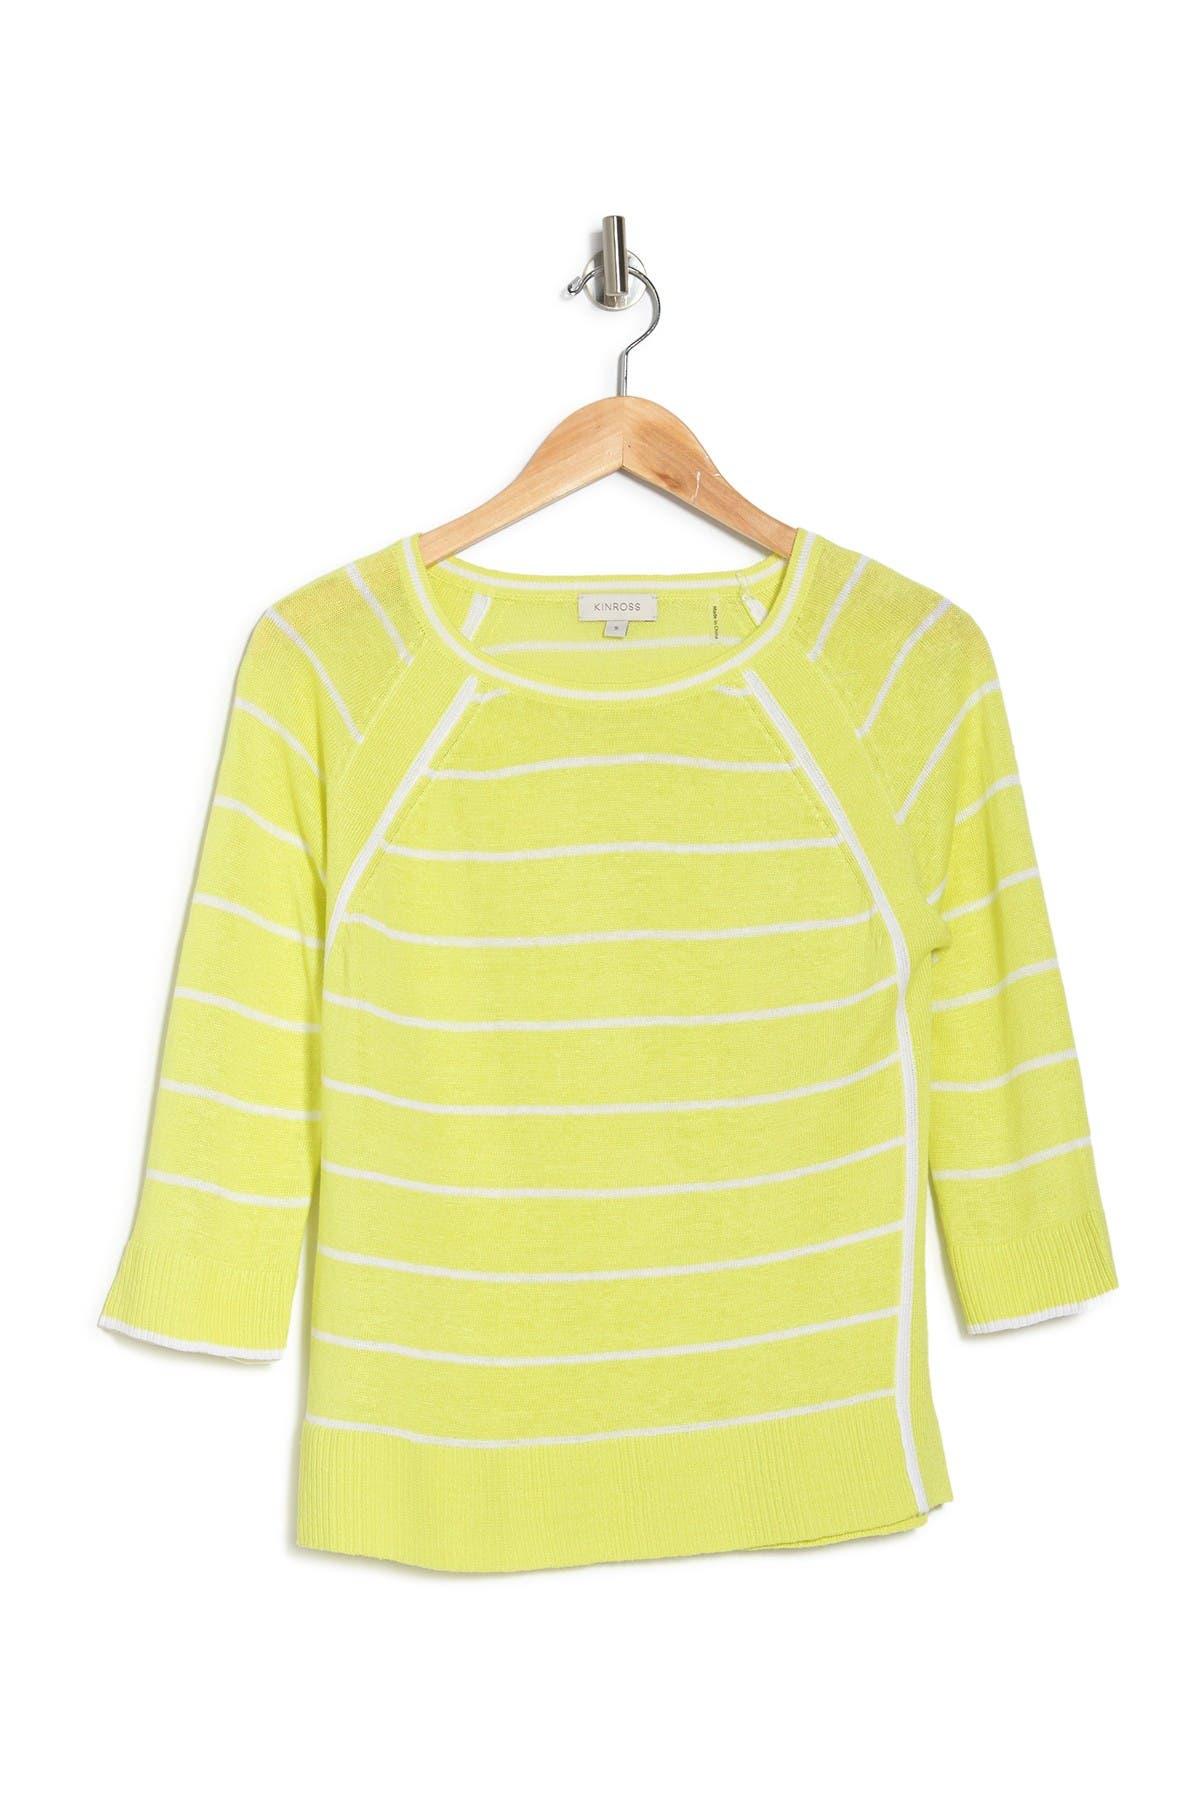 Image of Kinross Linen Knit Raglan Stripe Print Pullover Sweater